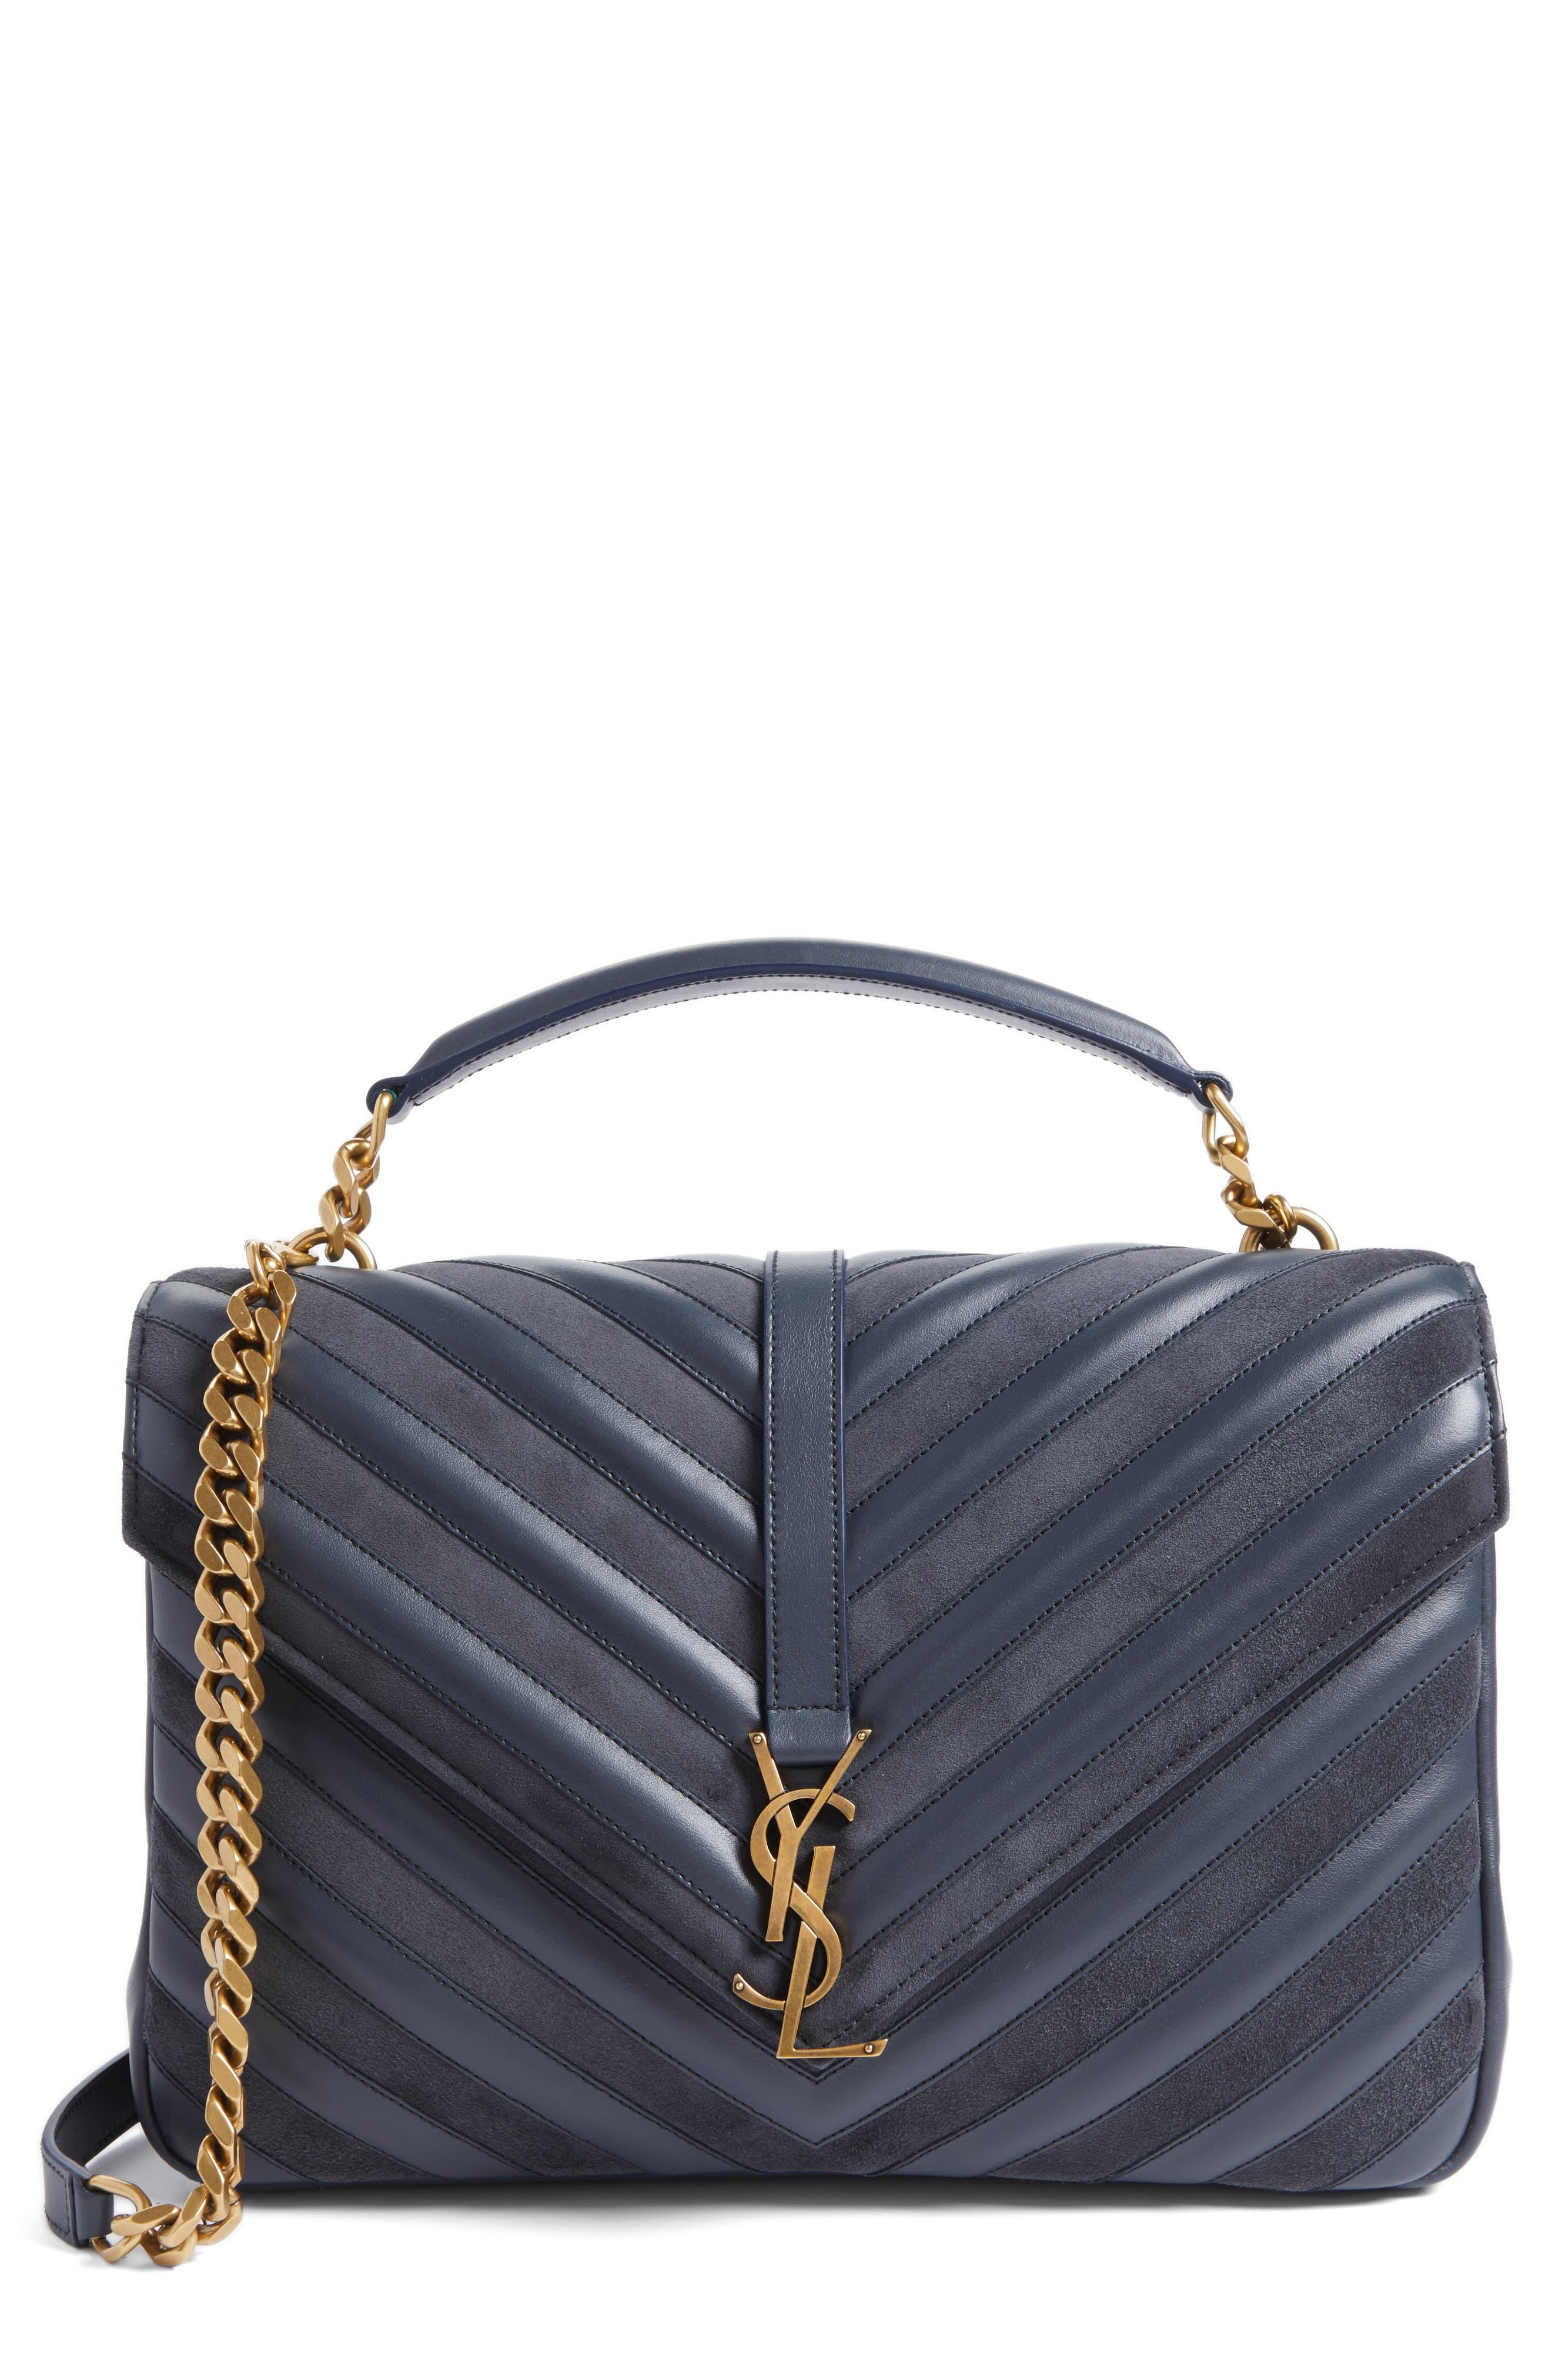 Medium College Patchwork Suede & Leather Shoulder Bag,                             Main thumbnail 1, color,                             Graphite